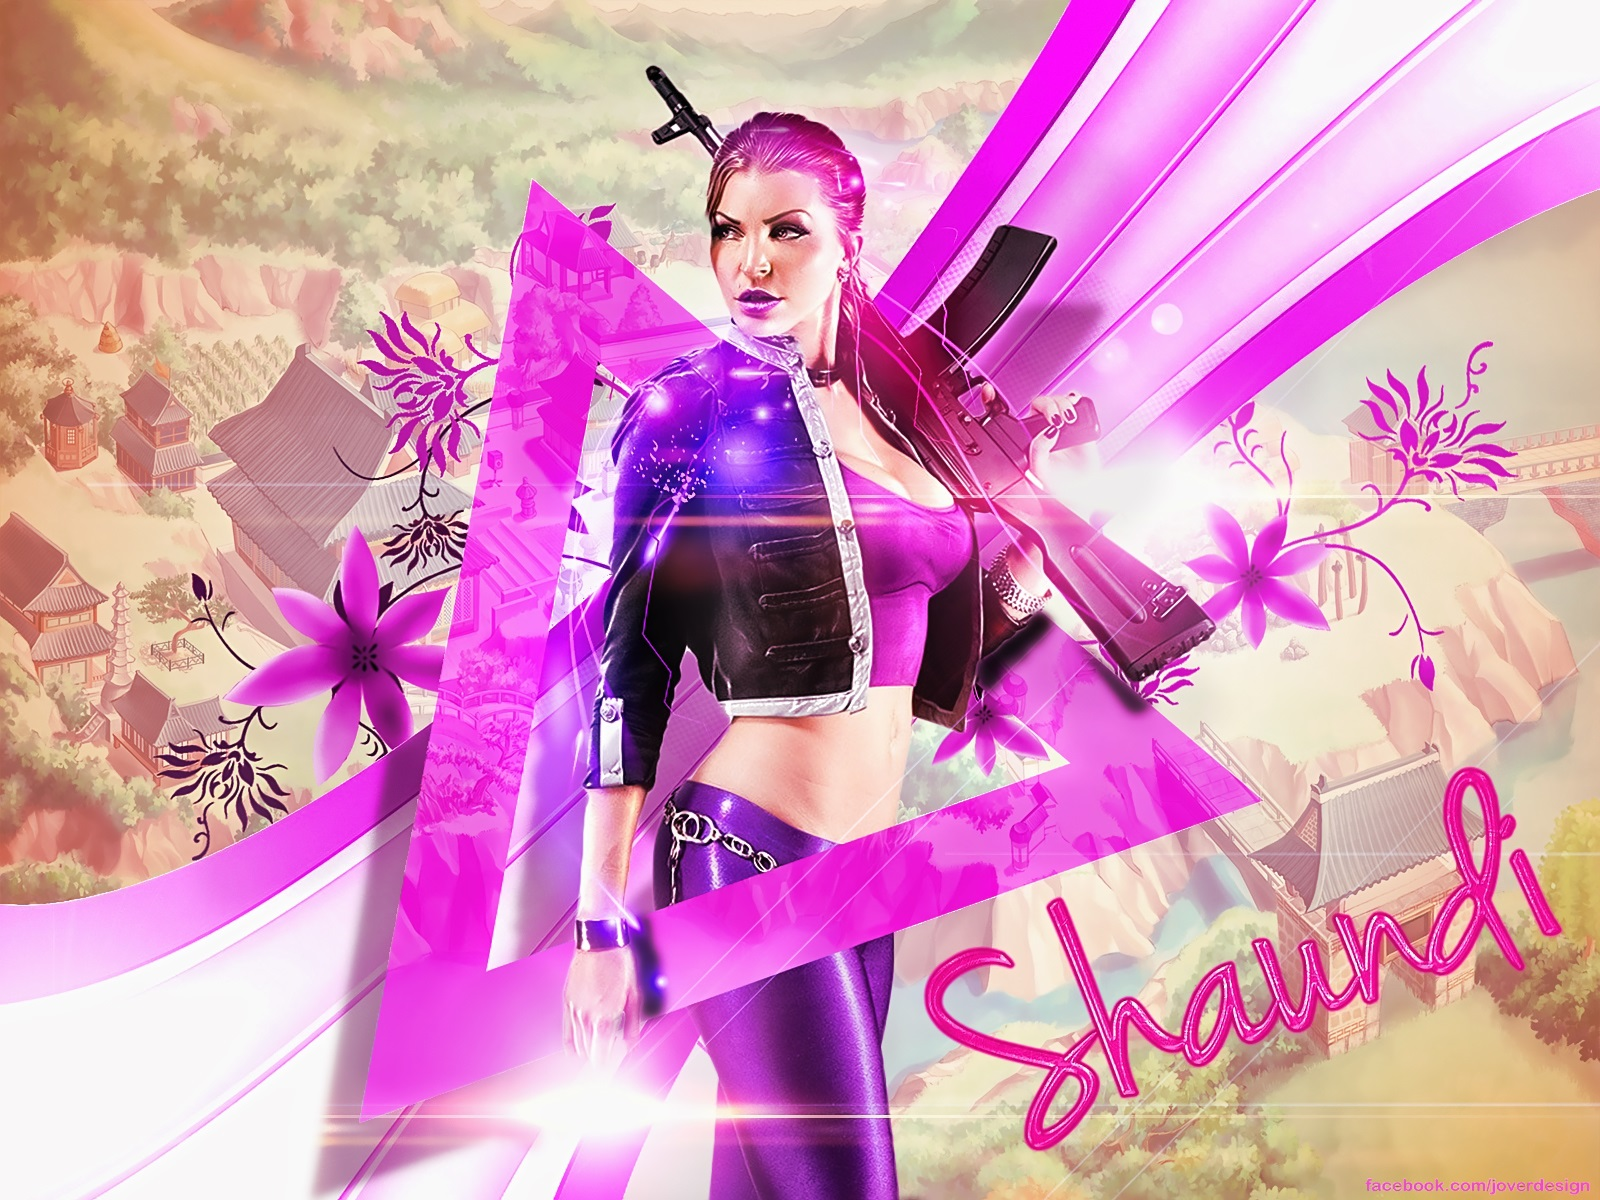 Shaundi Saints Row 2 And 3